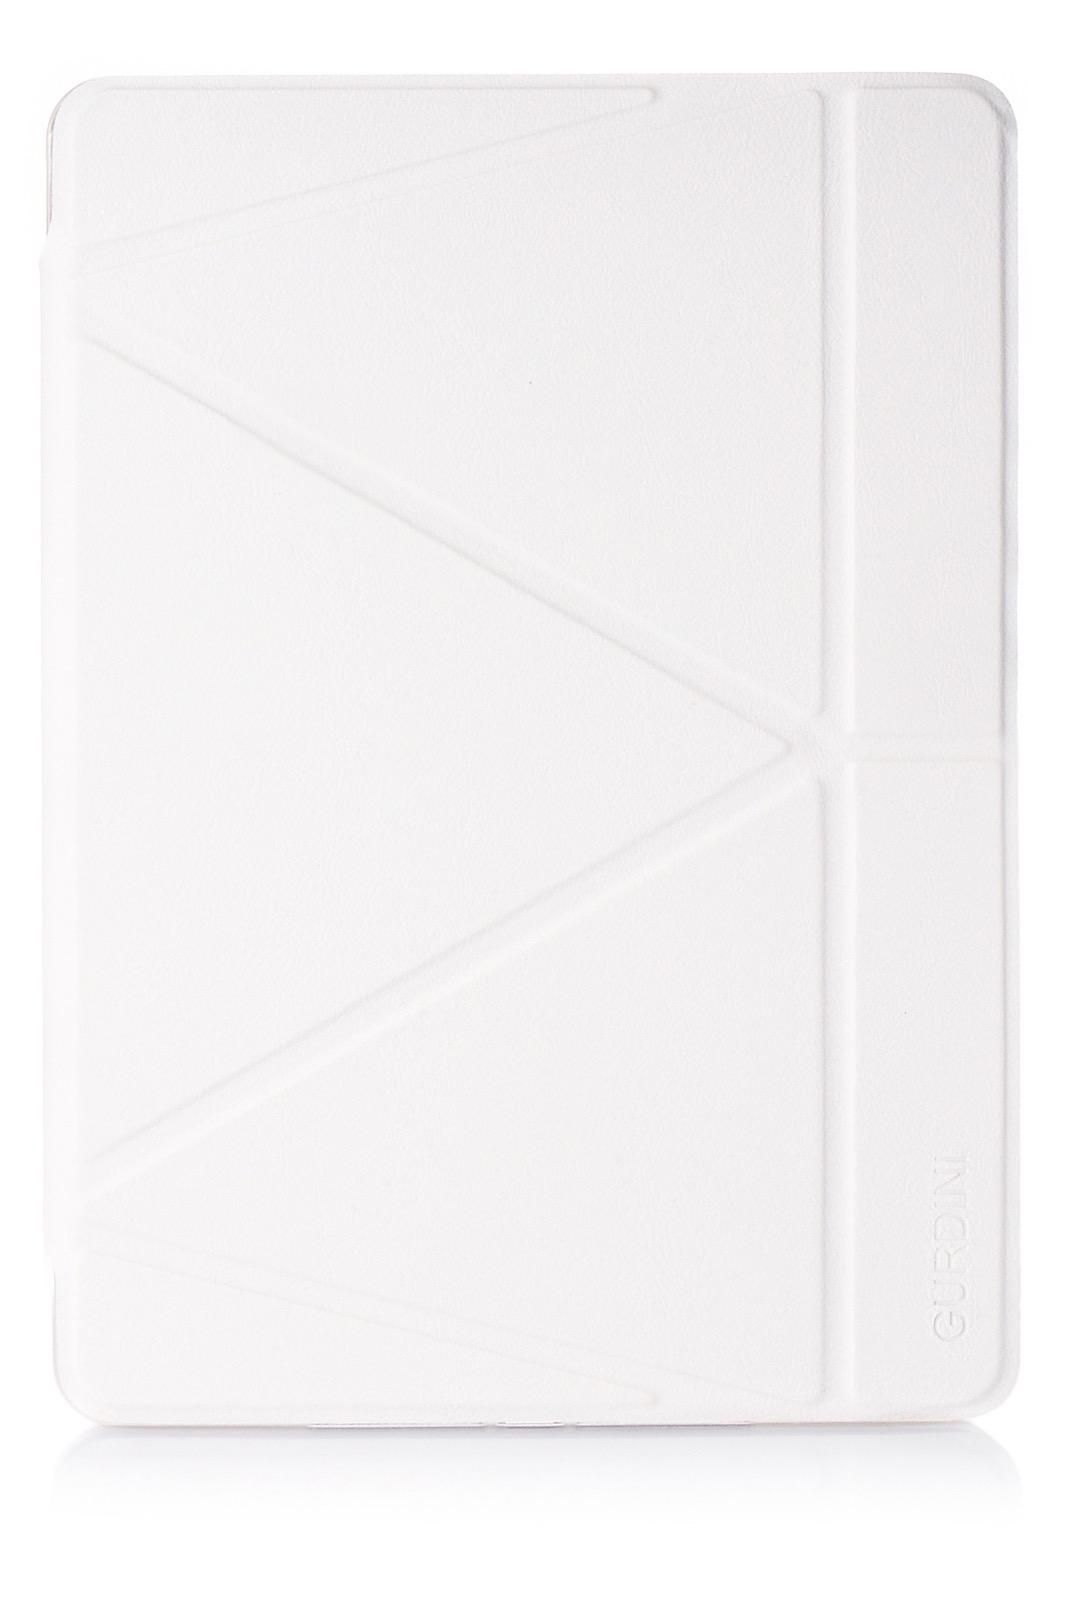 Чехол для планшета Gurdini Lights Series книжка Apple iPad Air, белый